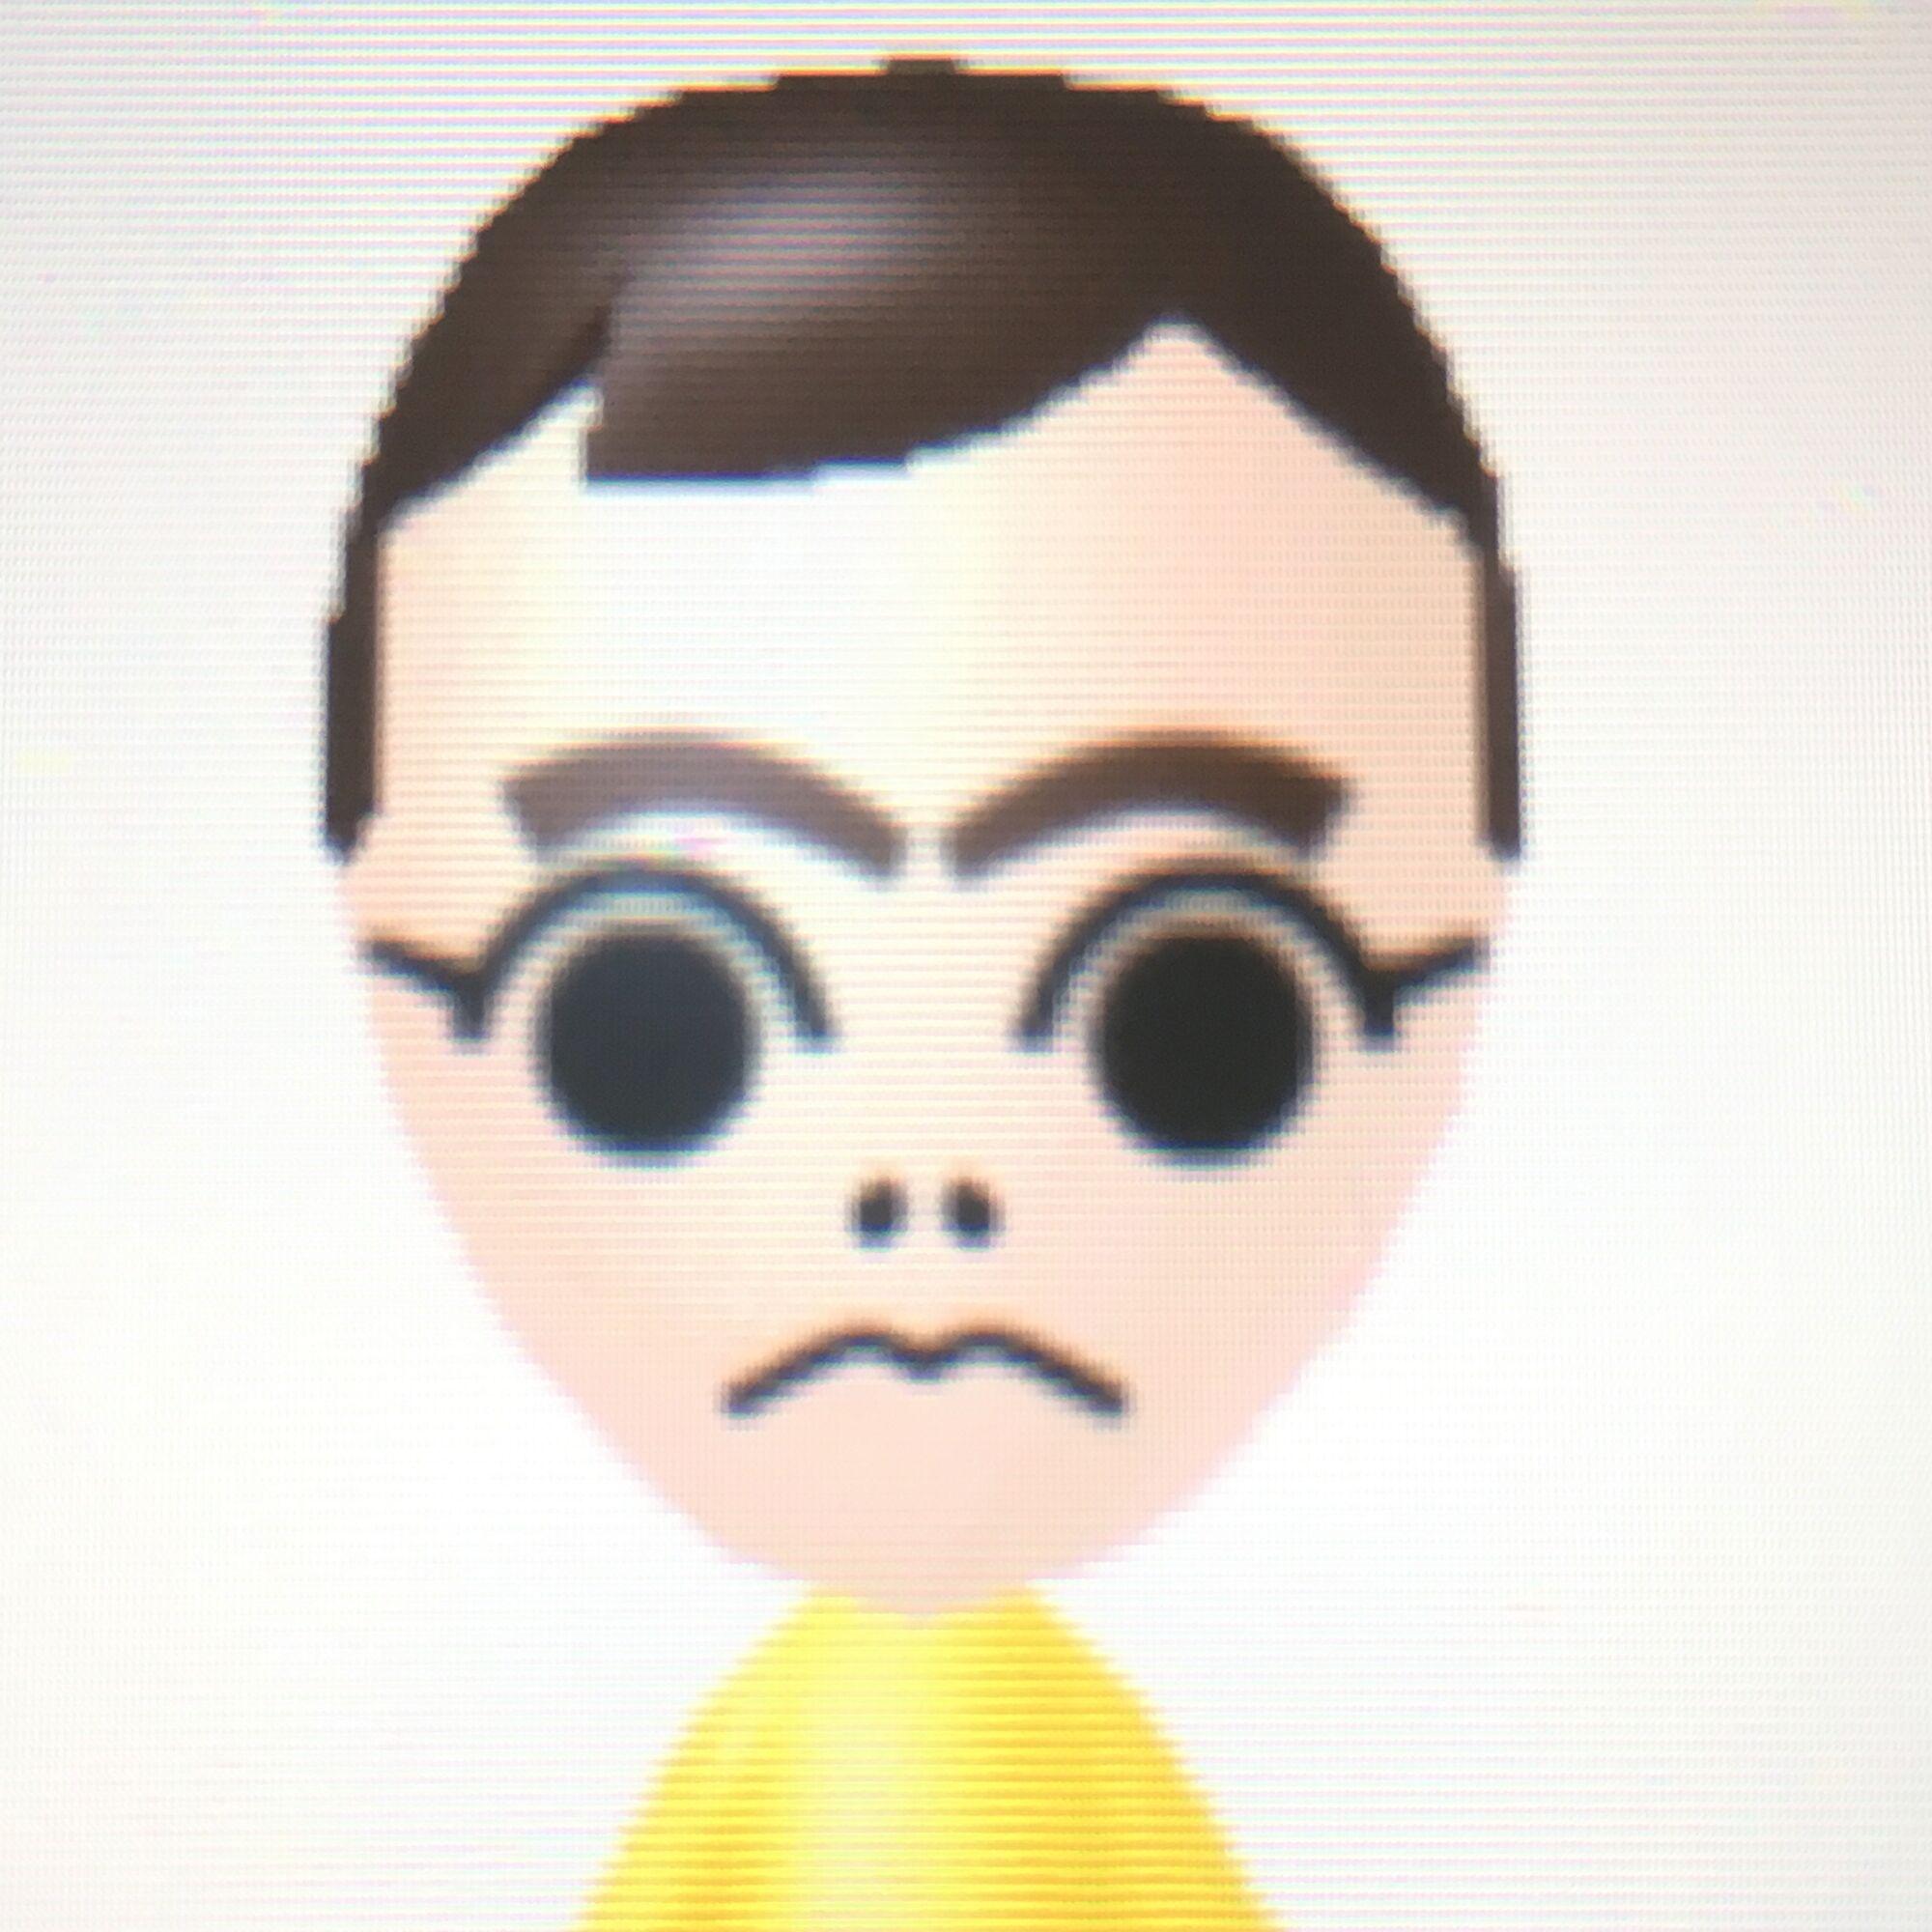 Asami-Chika (Wii Sports Resort)